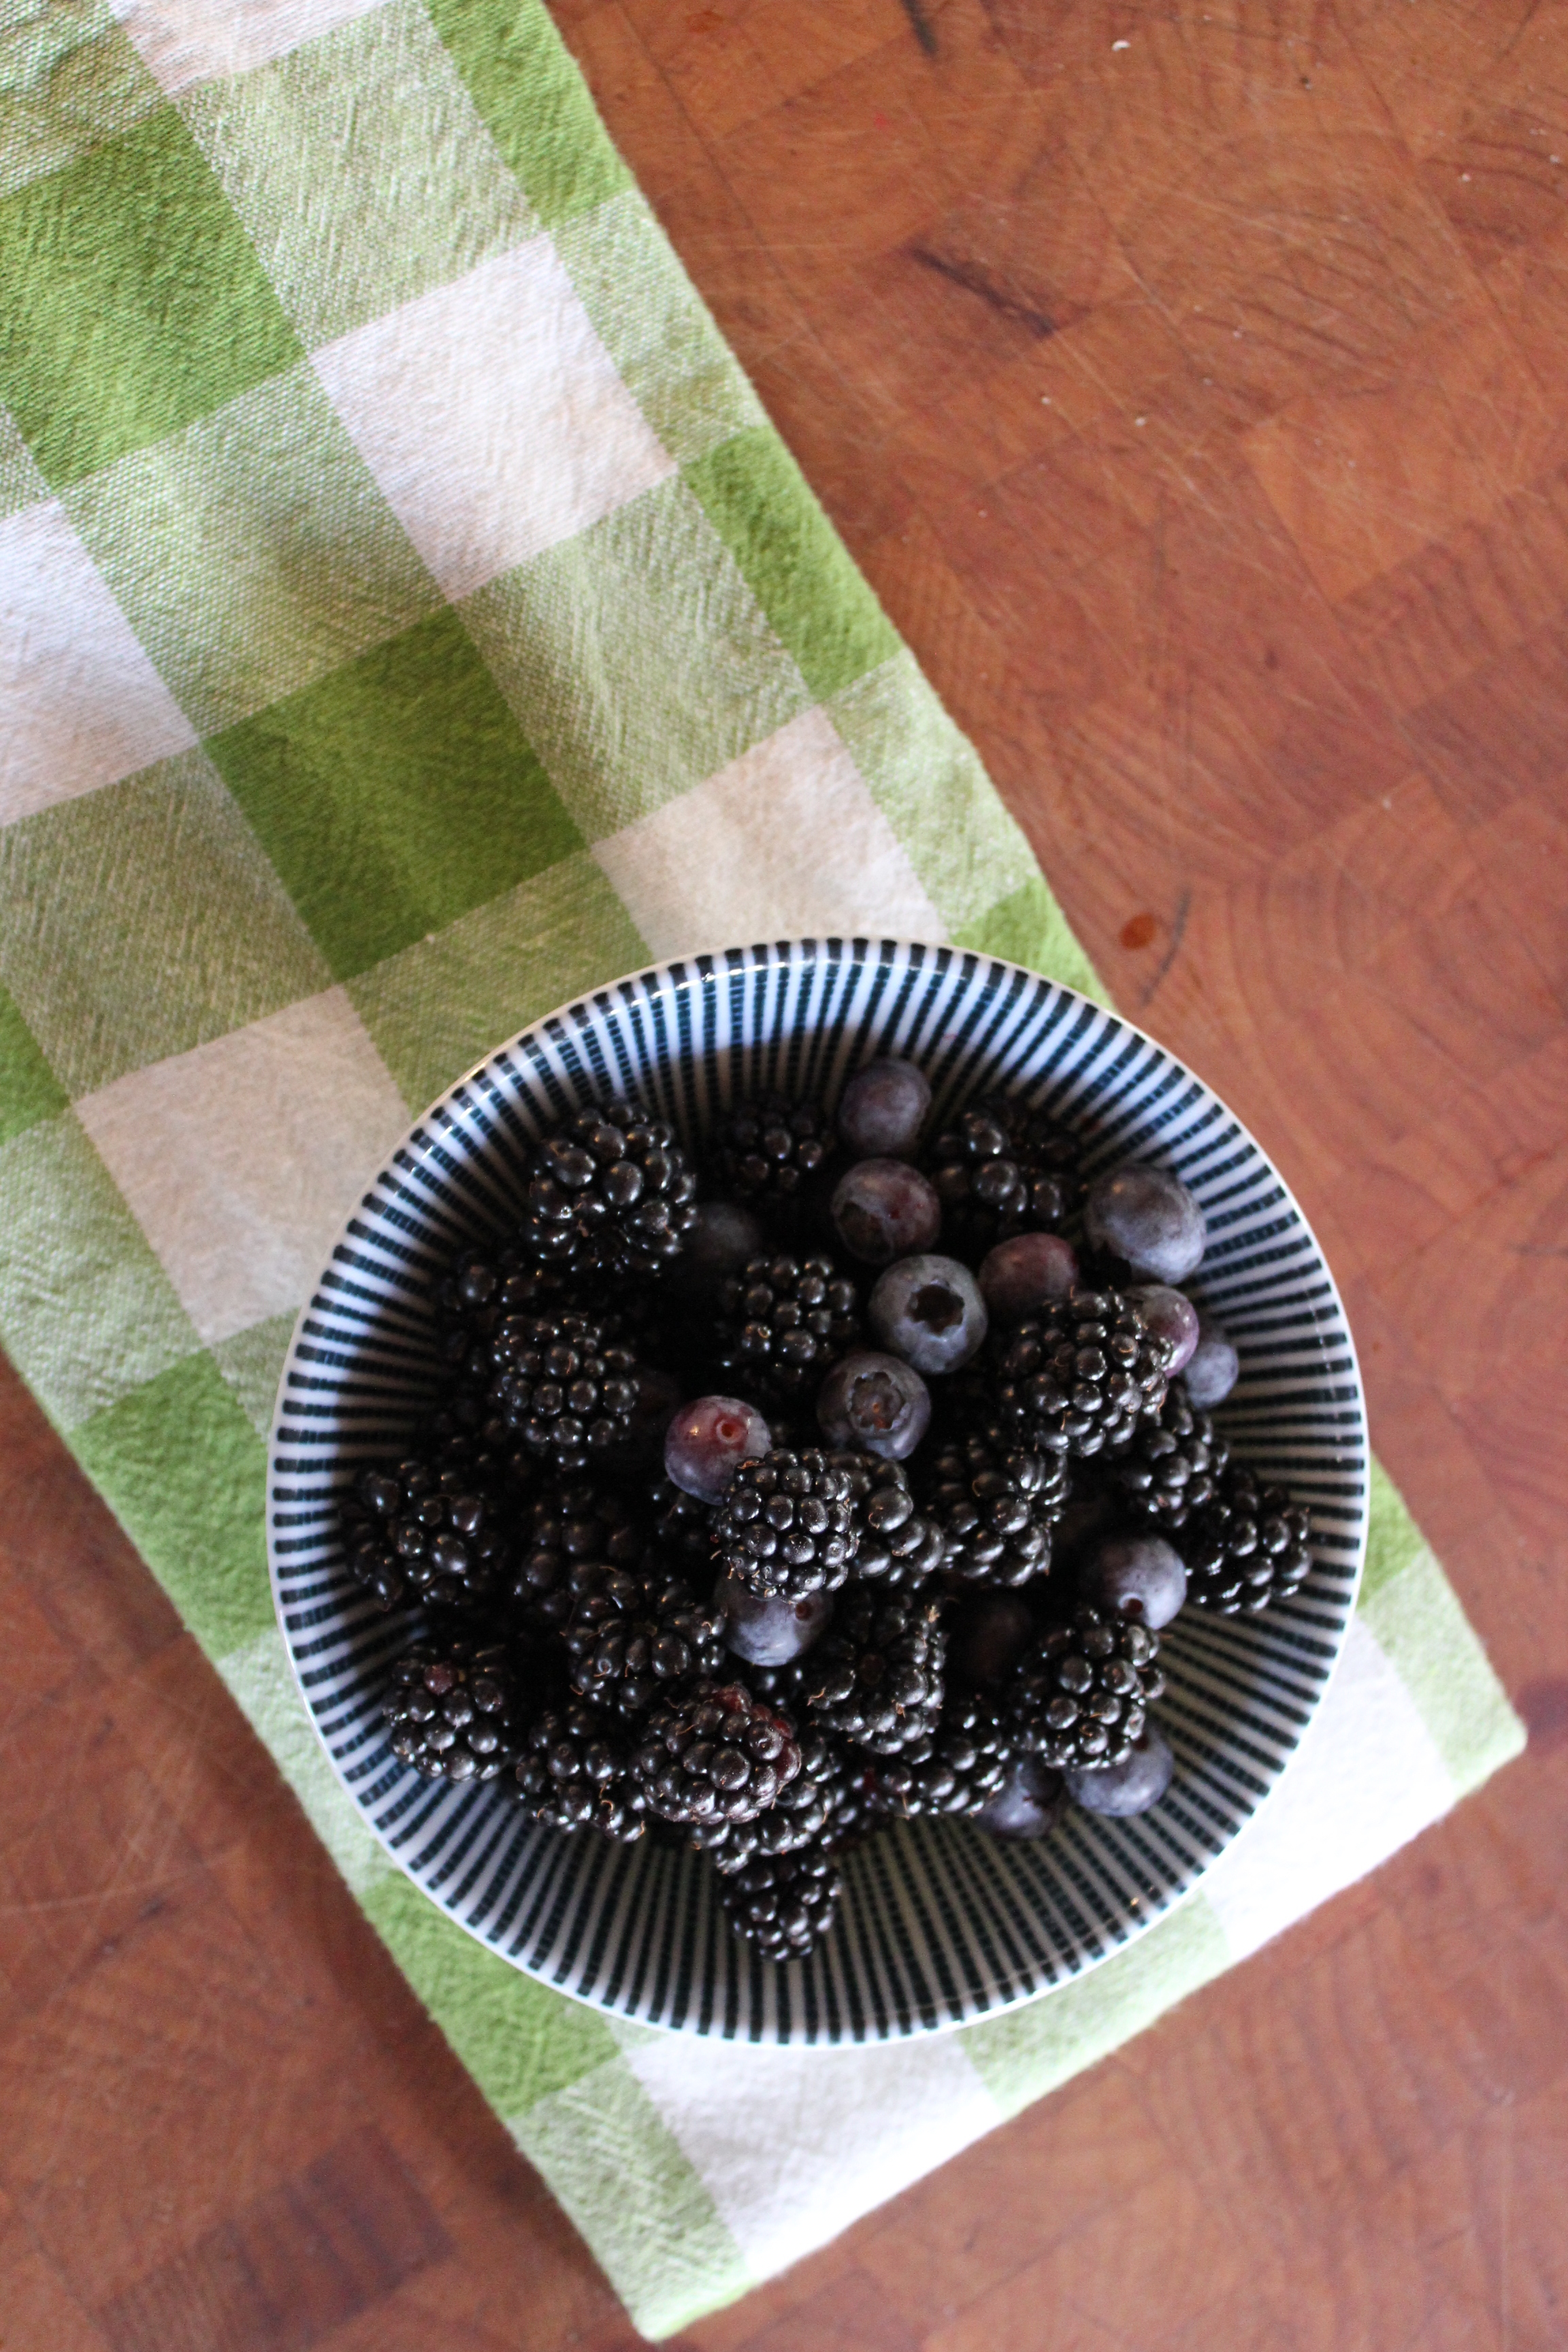 blackberry treats at plum nelli farmstay.JPG